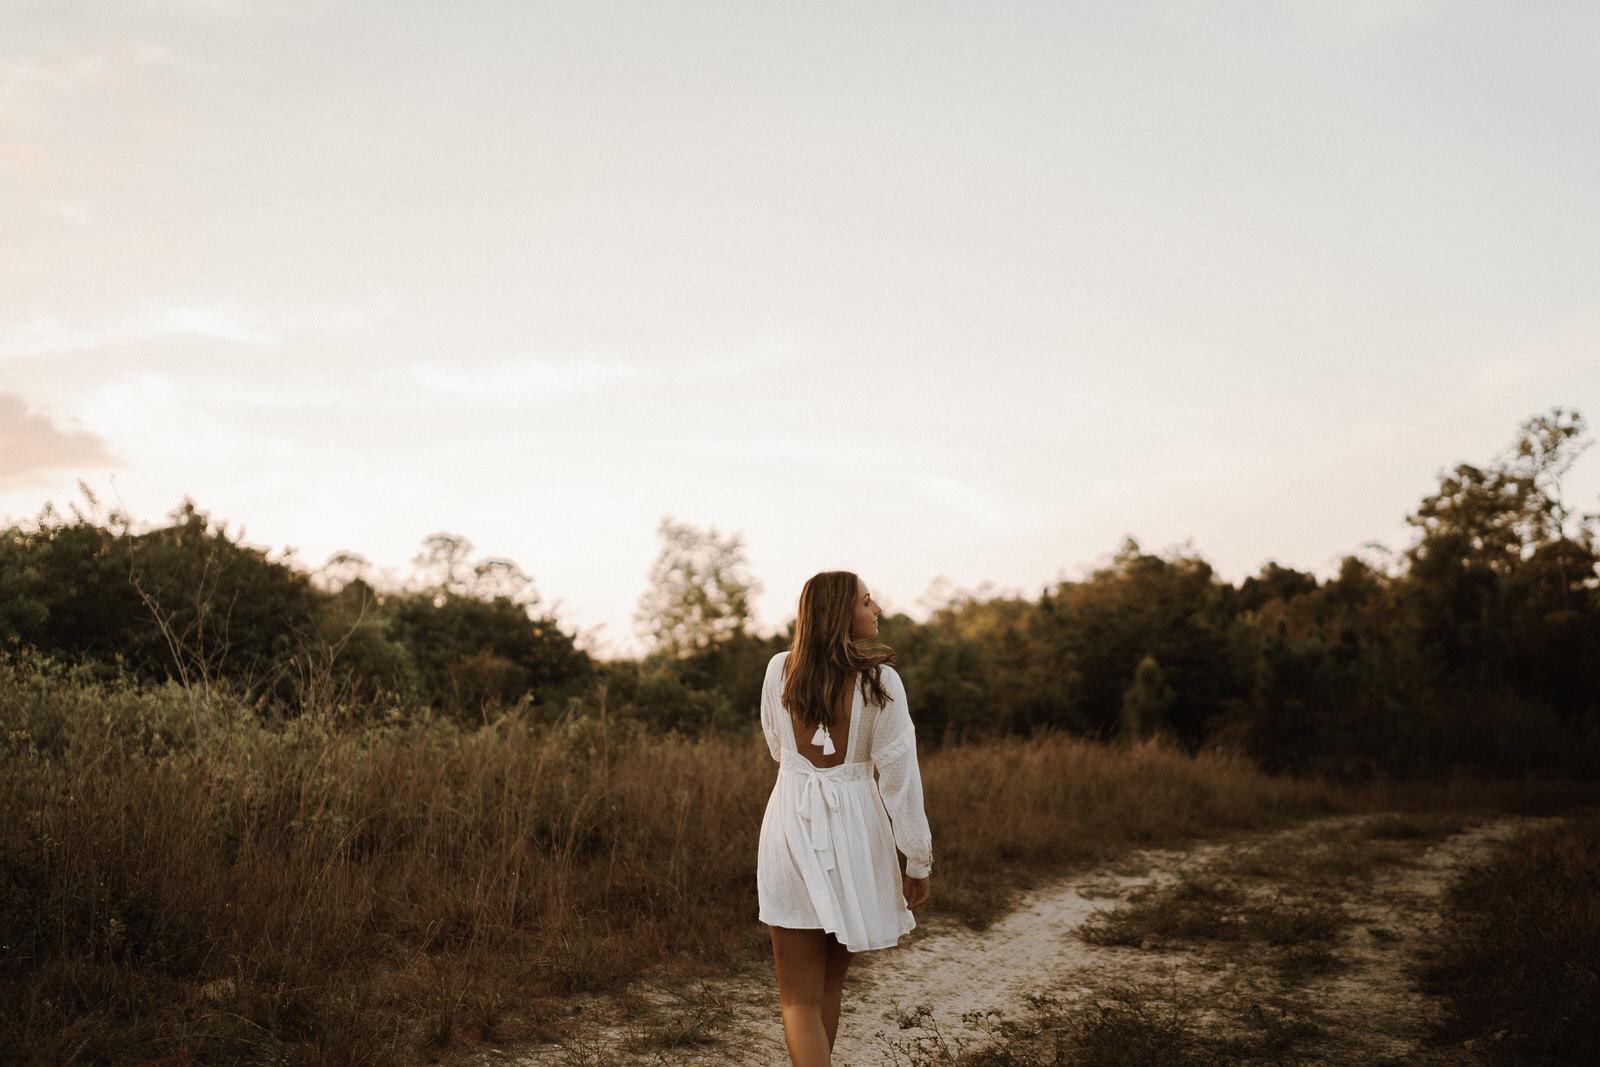 Fort Myers Senior Photos- Michelle Gonzalez Photography- Kate McQuagge-149.JPG